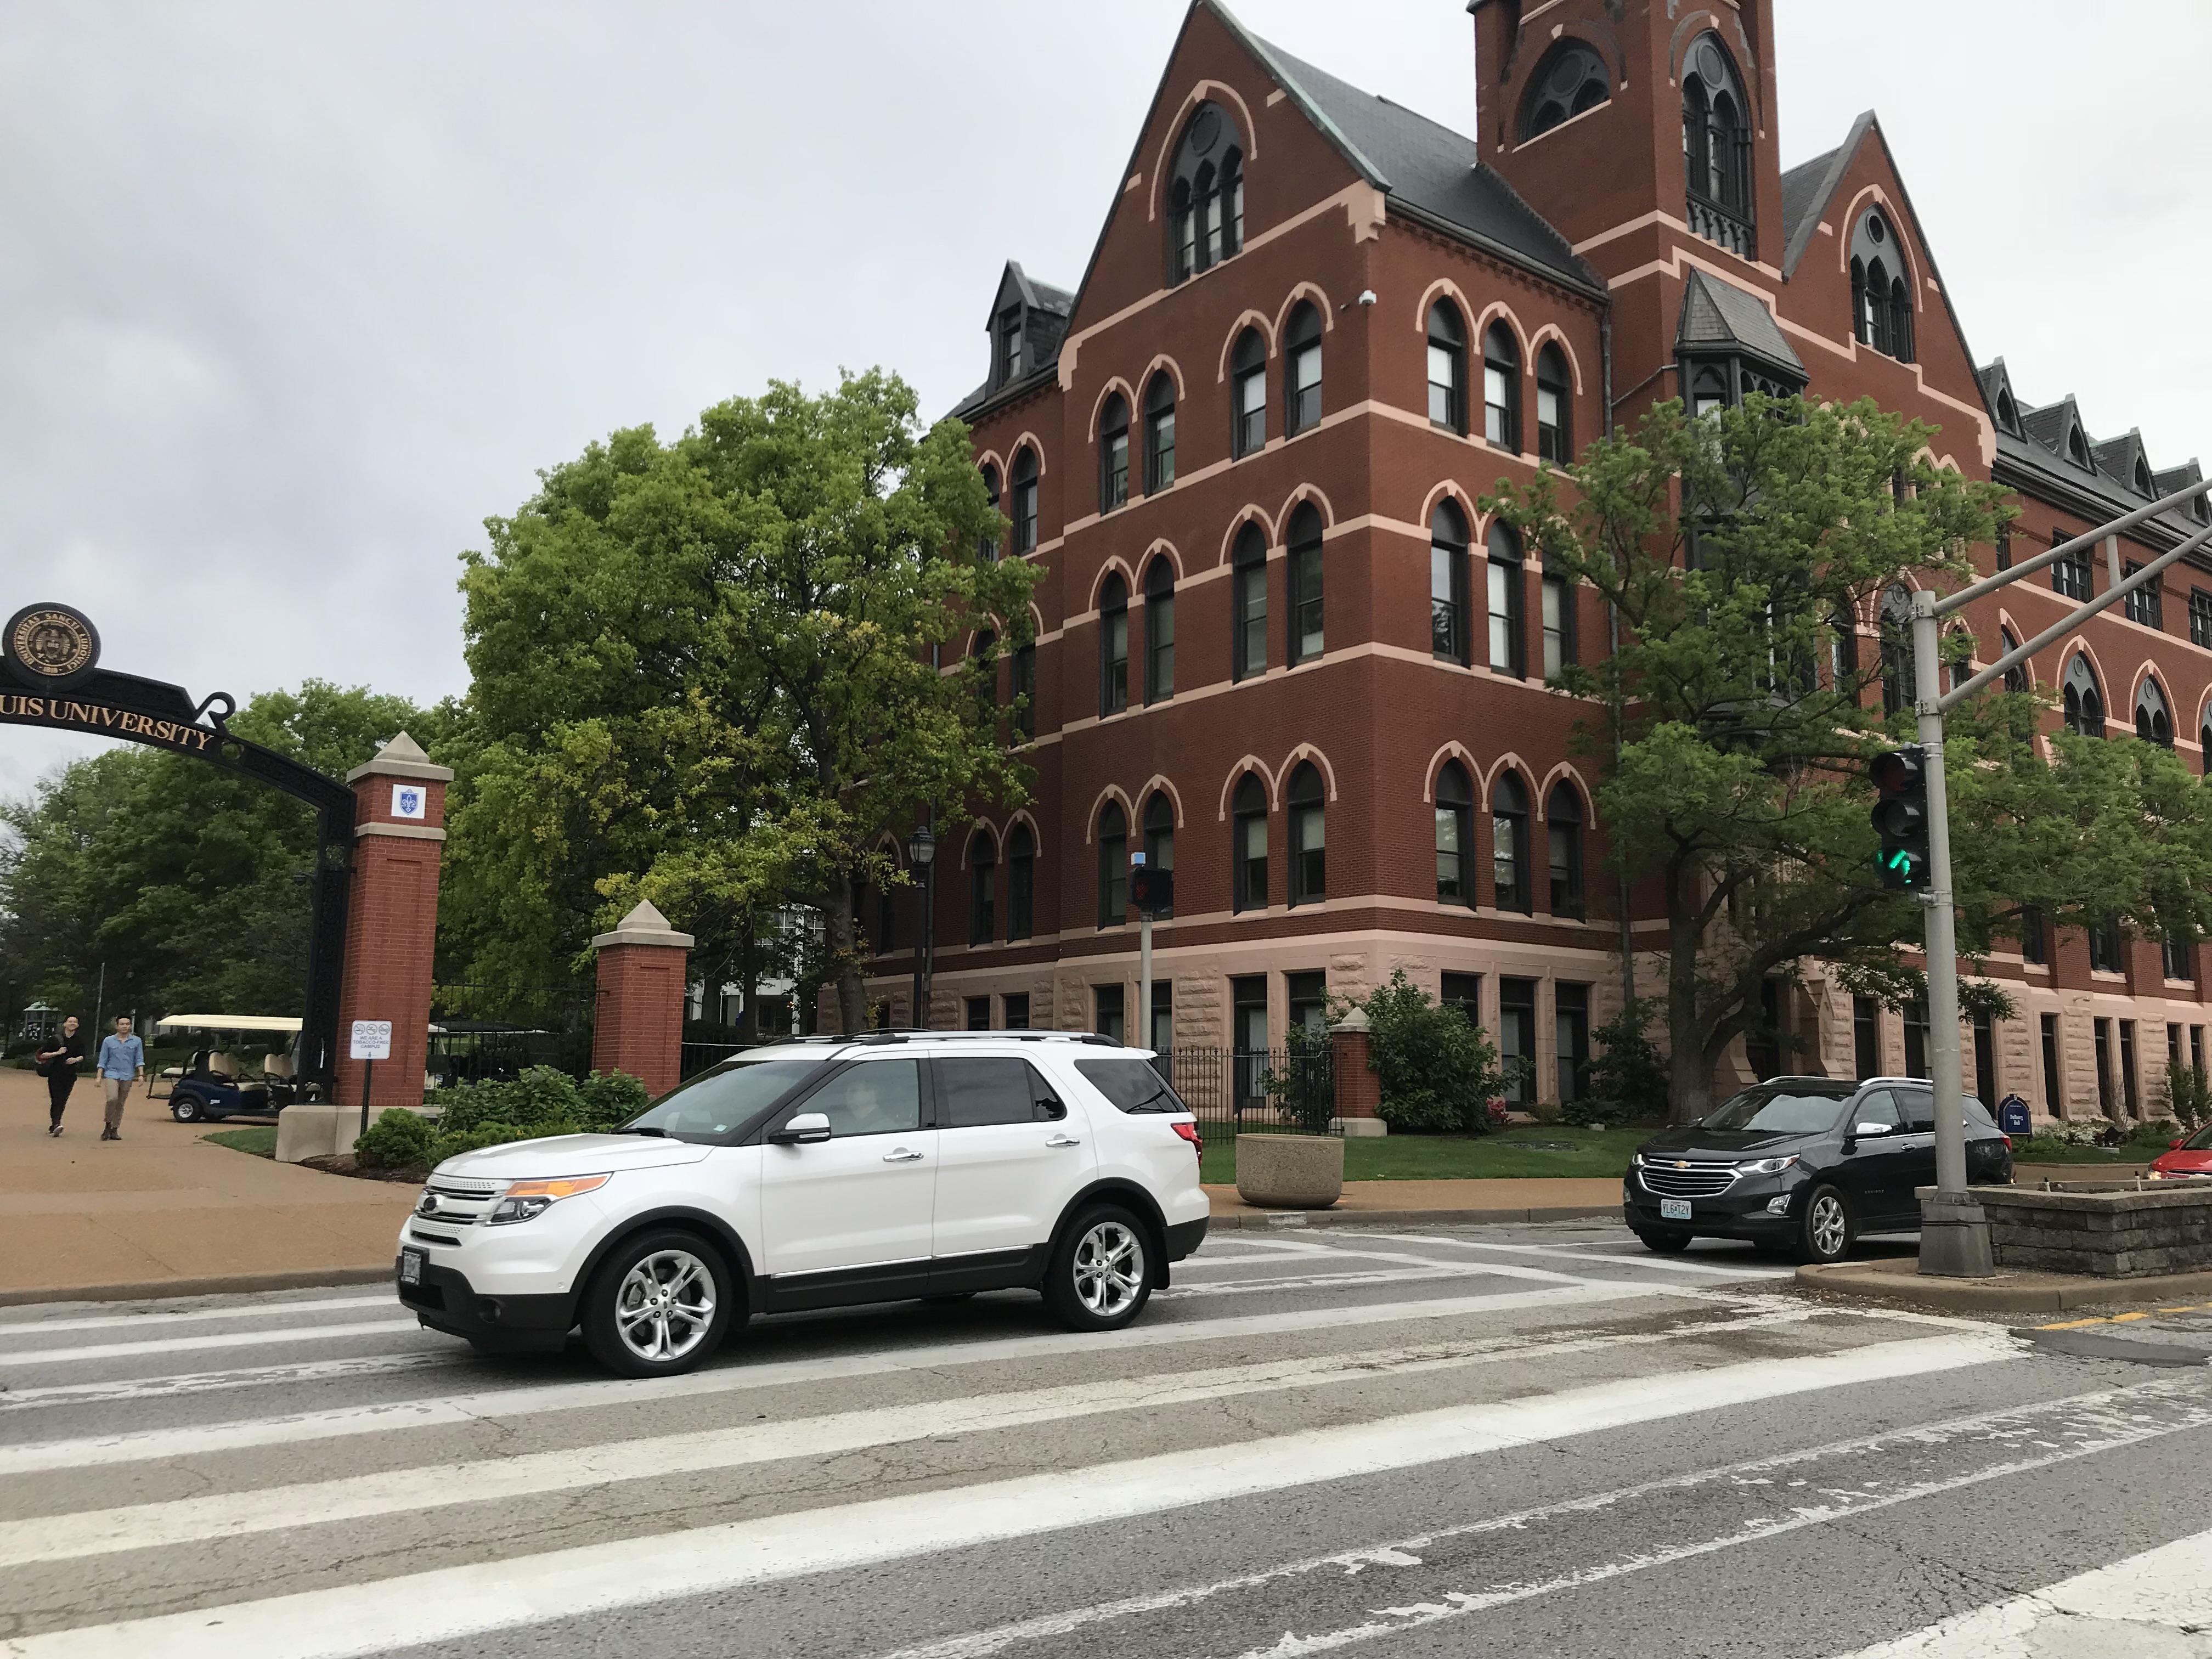 SLU to begin Grand crosswalk improvements and road diet